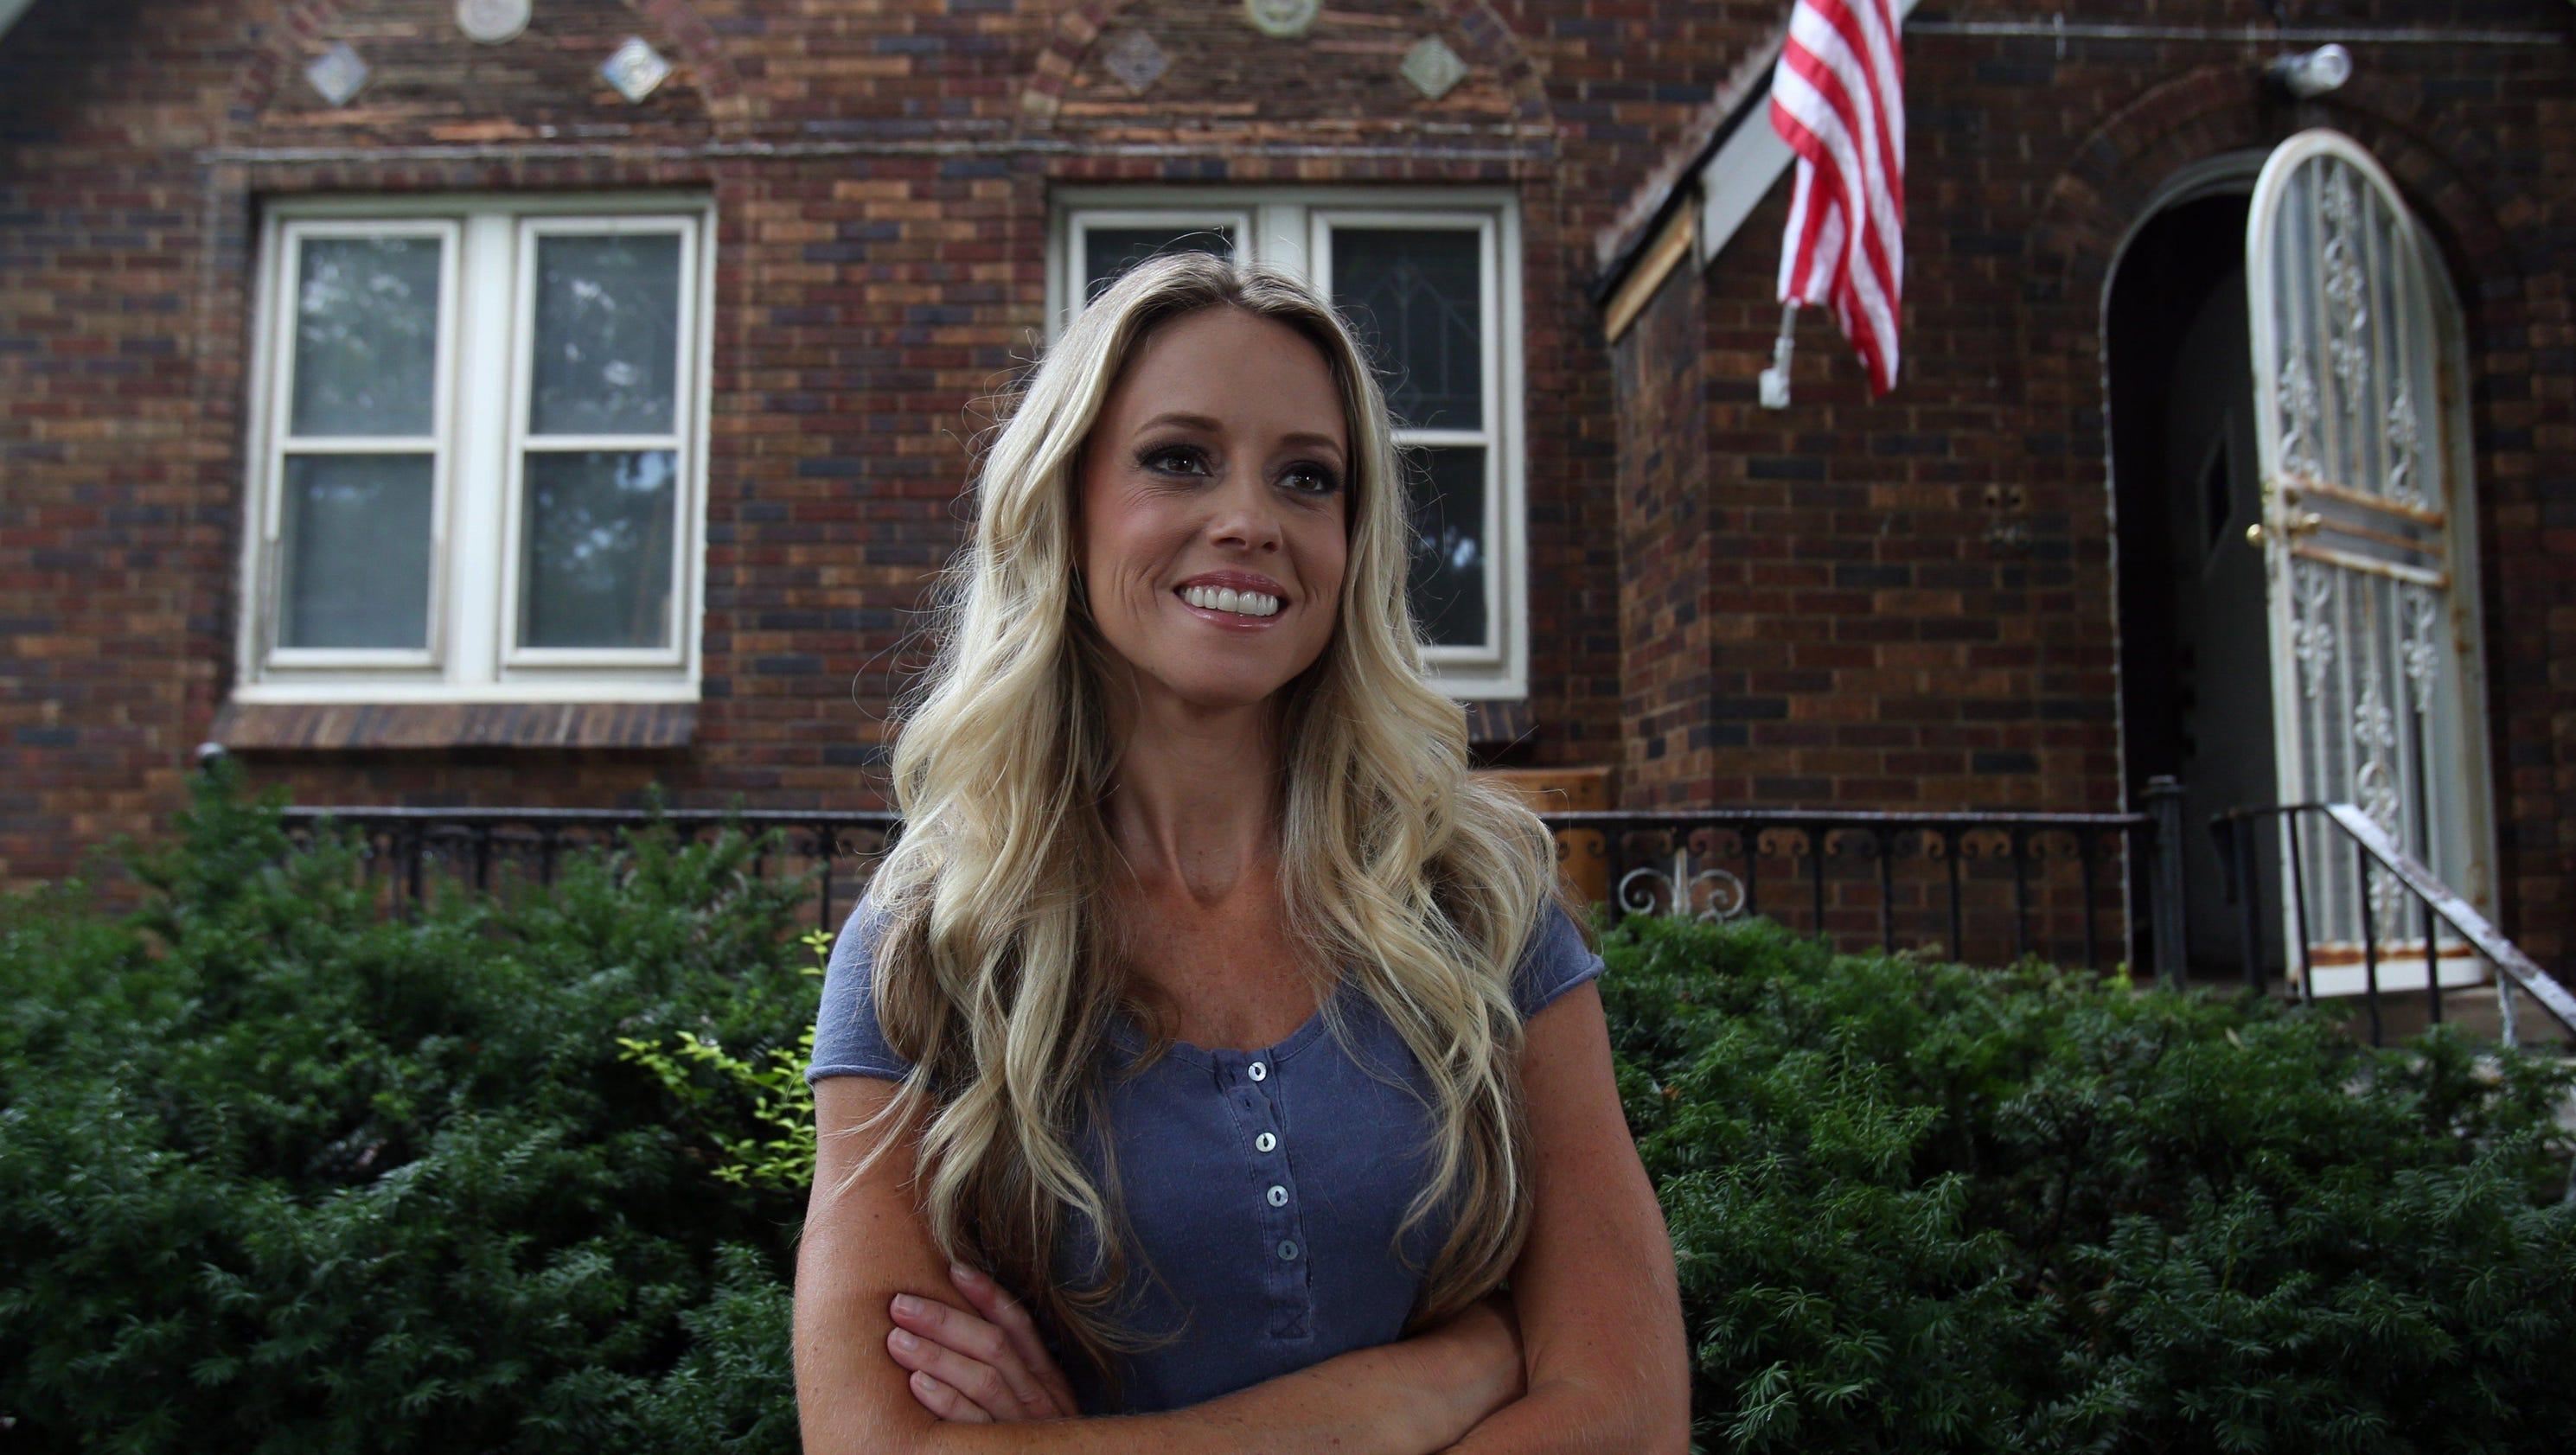 Rehab Addict Star Nicole Curtis Risks Jail In Custody Case